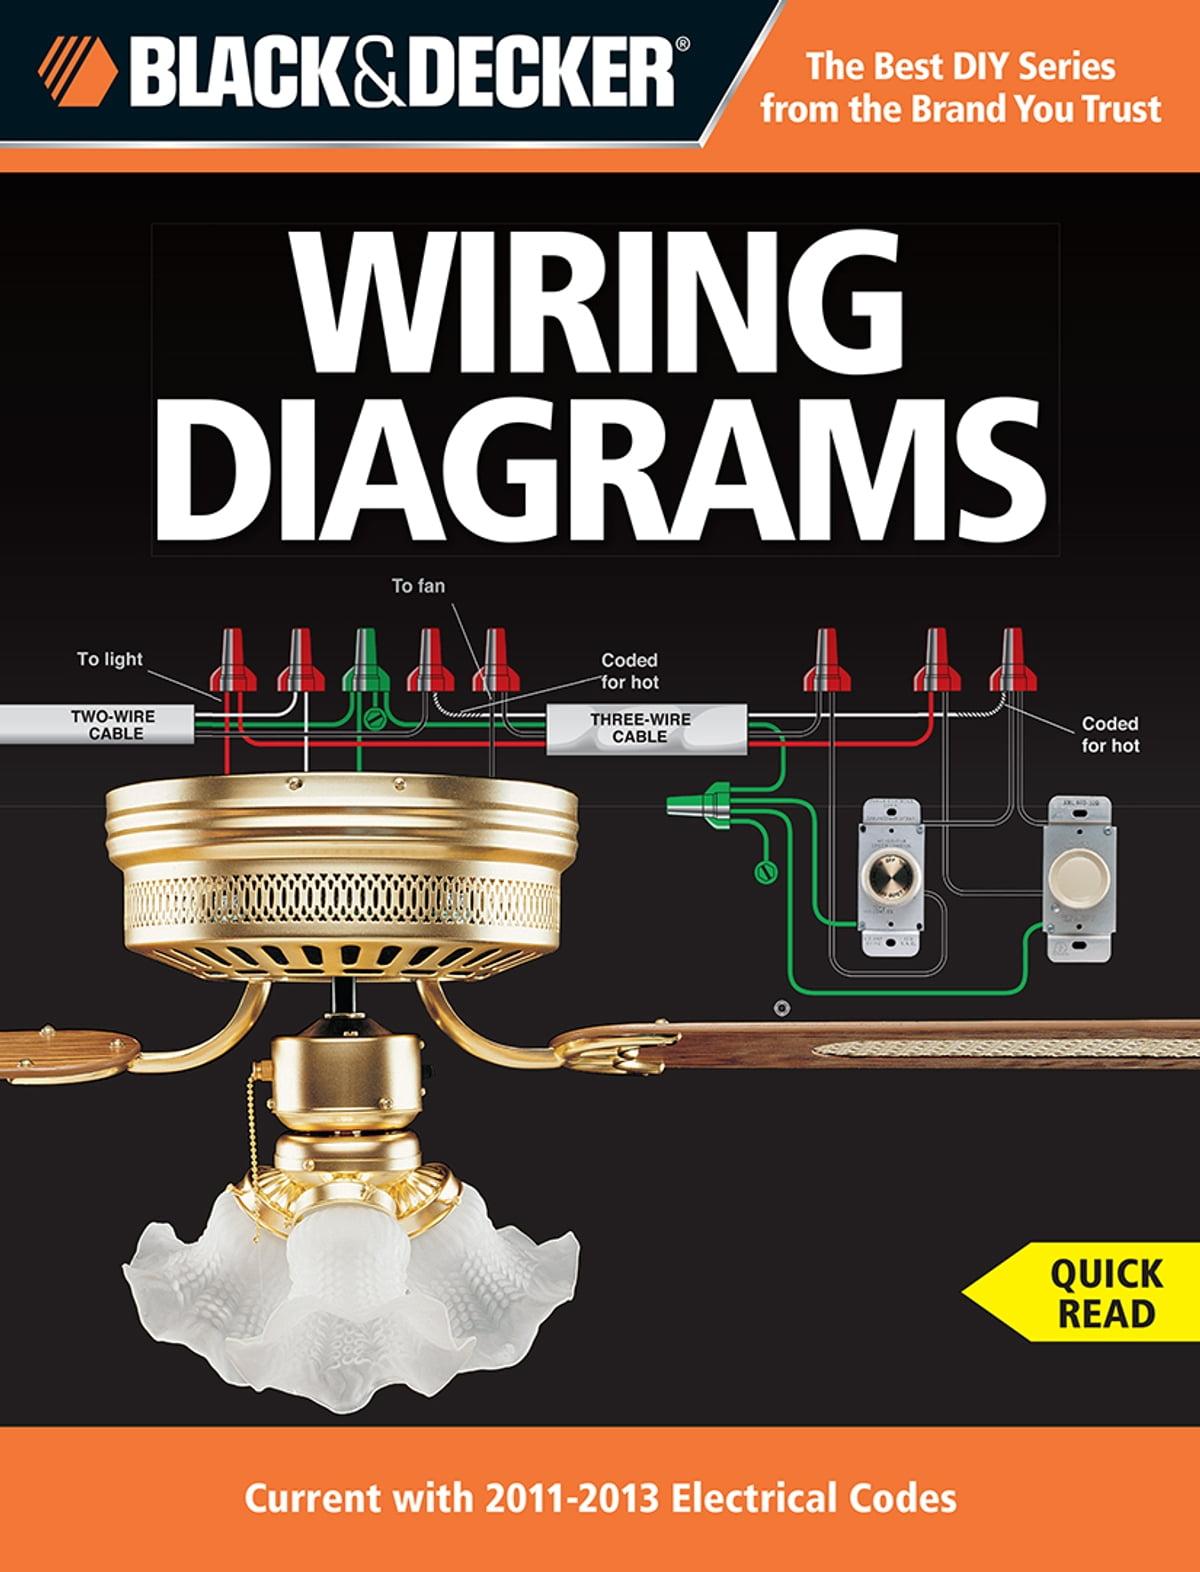 diy electrical wiring diagrams mitsubishi stereo diagram black decker ebook by editors of cpi kobo rakuten